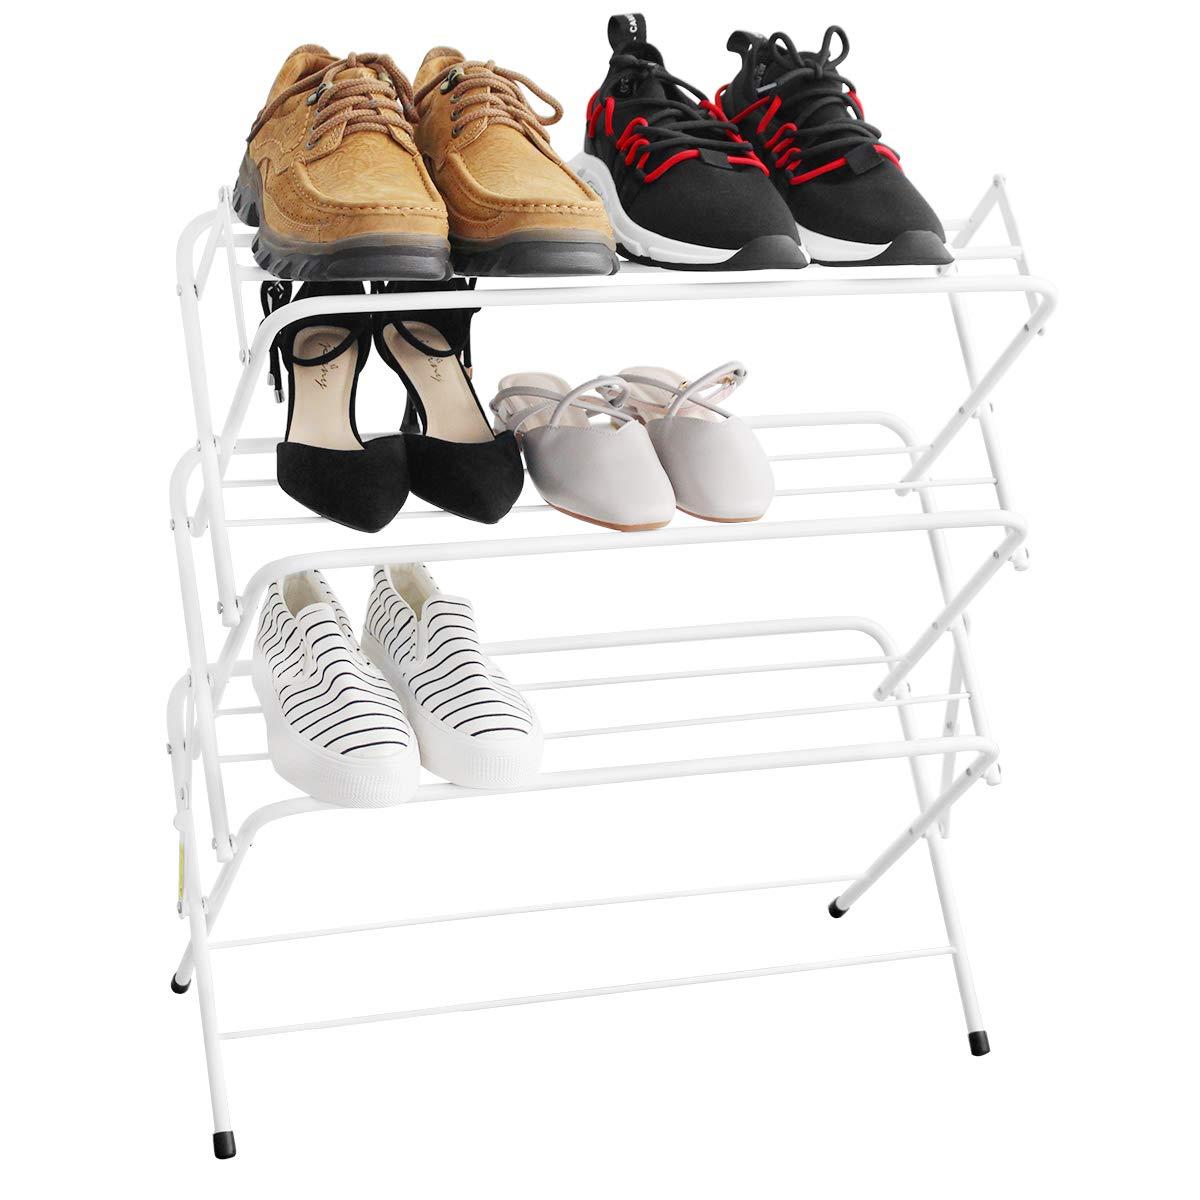 Zenree Shoe Racks Dorm Room Essentials - Portable Folding Shelf Storage Organizer for College Bedroom/Apartment, Matt White